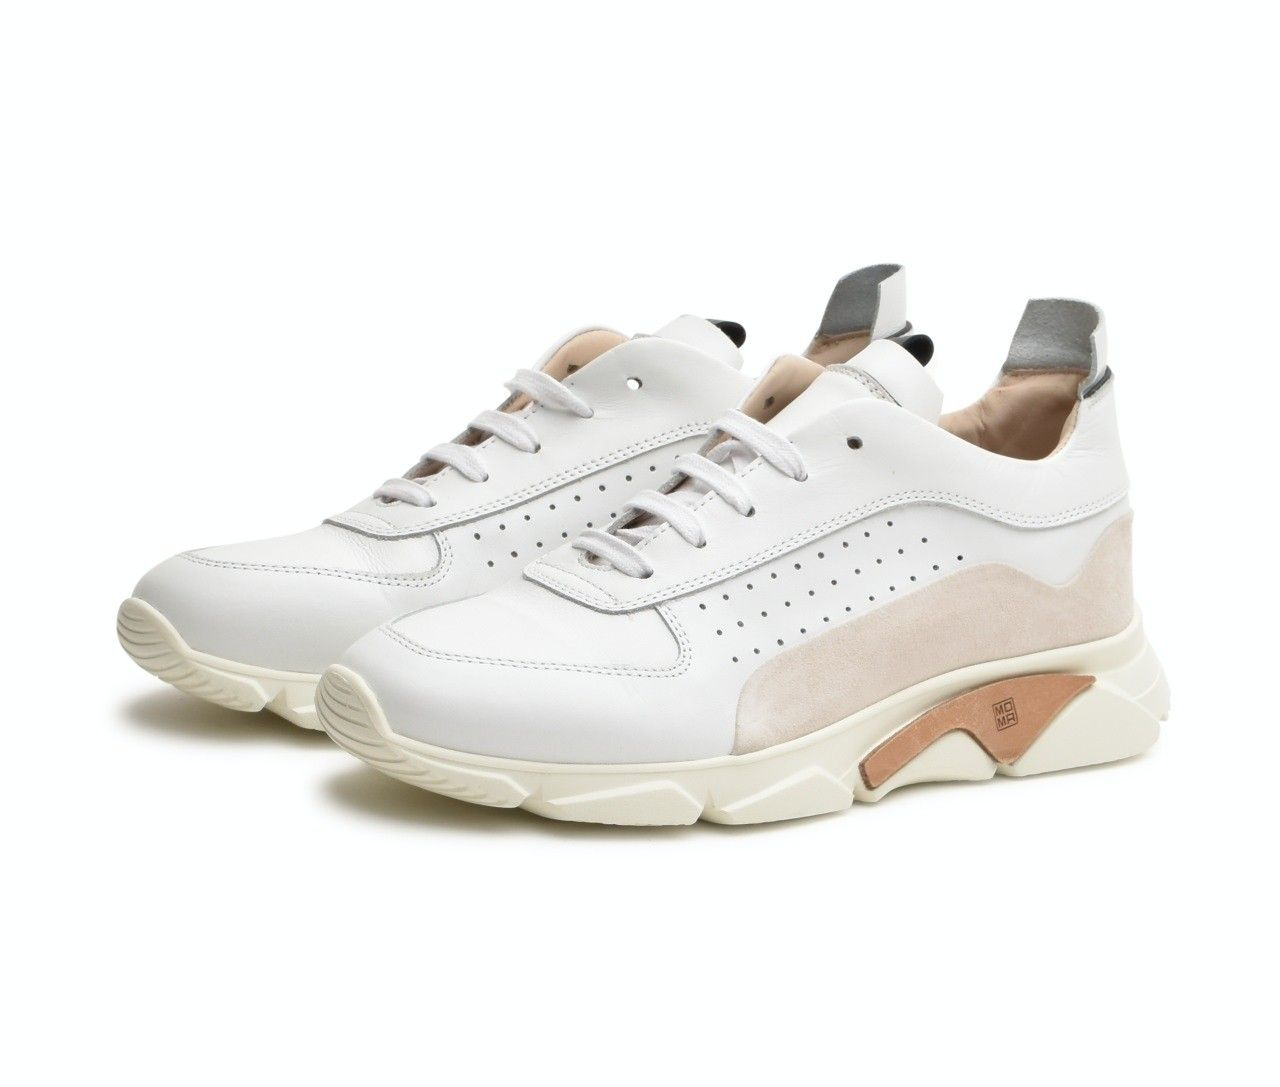 MOMA - Herren Sneaker - Box & Tony - Bianco / Bianco